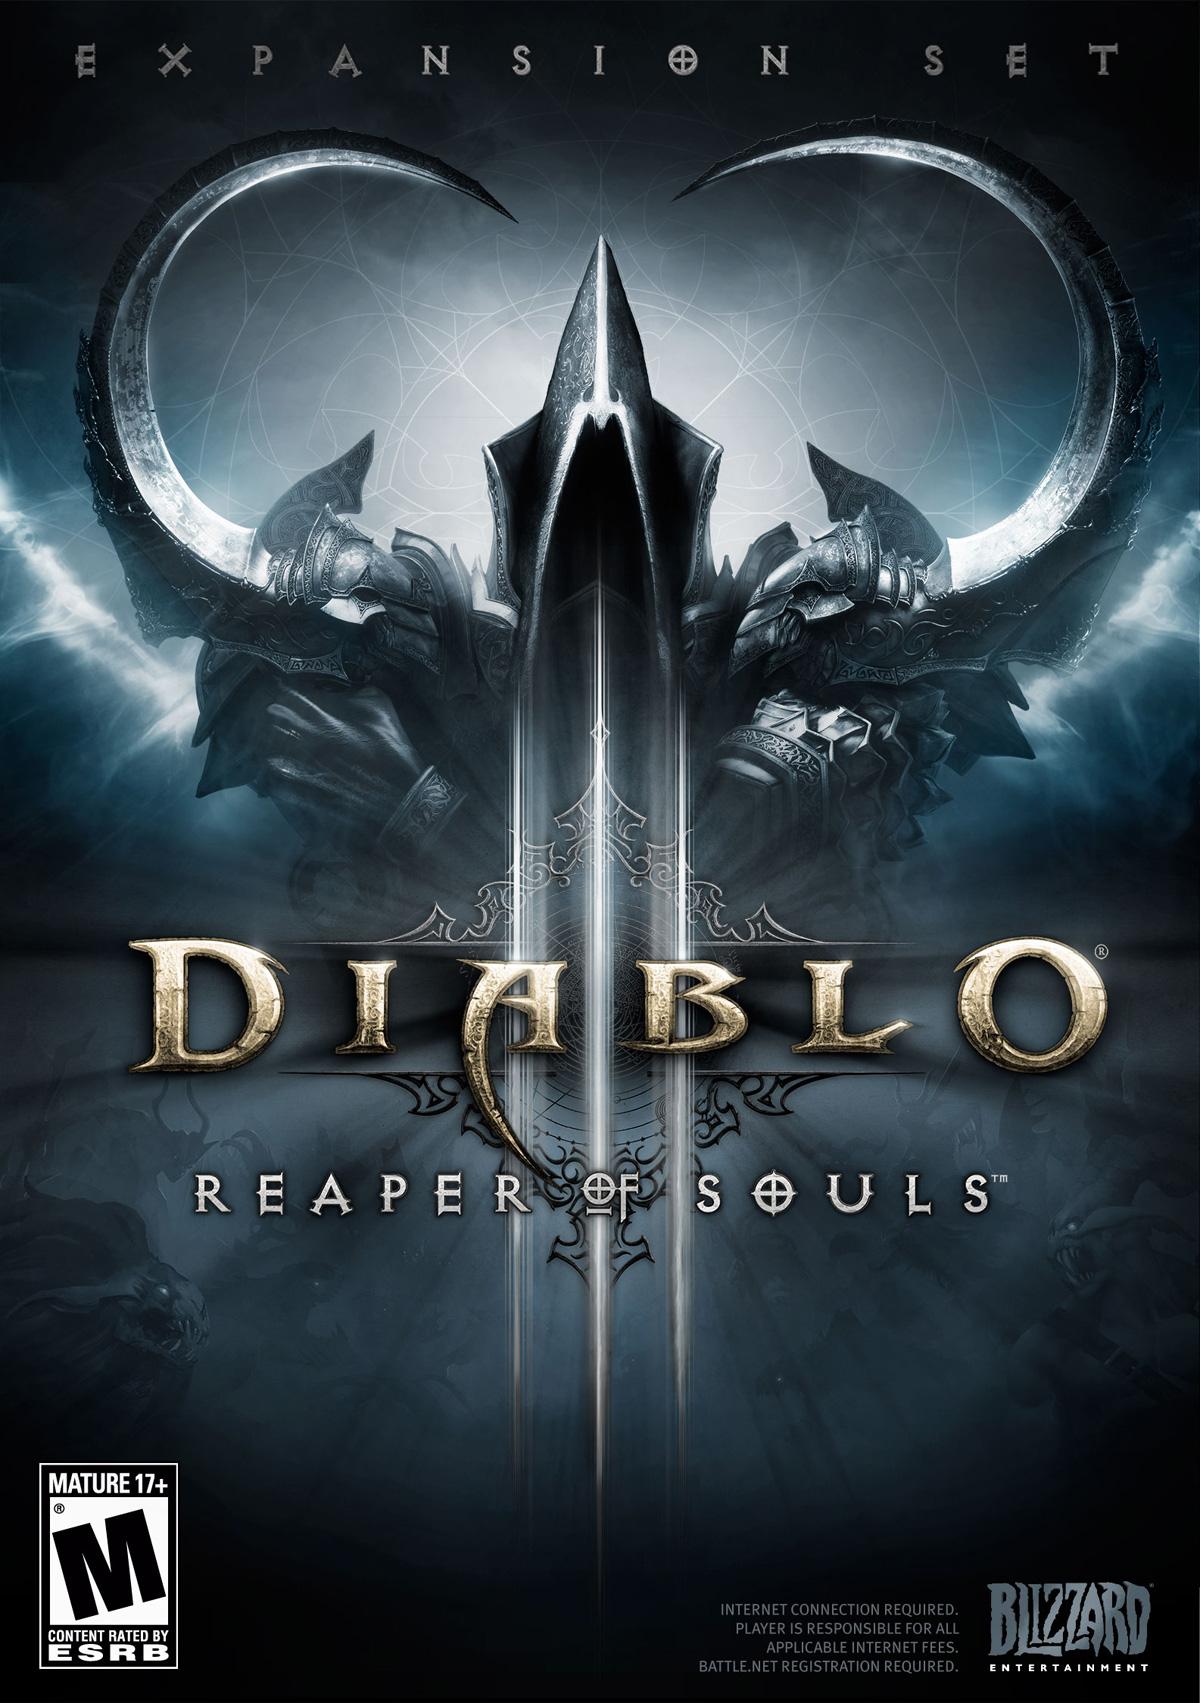 DiabloIII-ReaperofSouls PC Jaquette 001